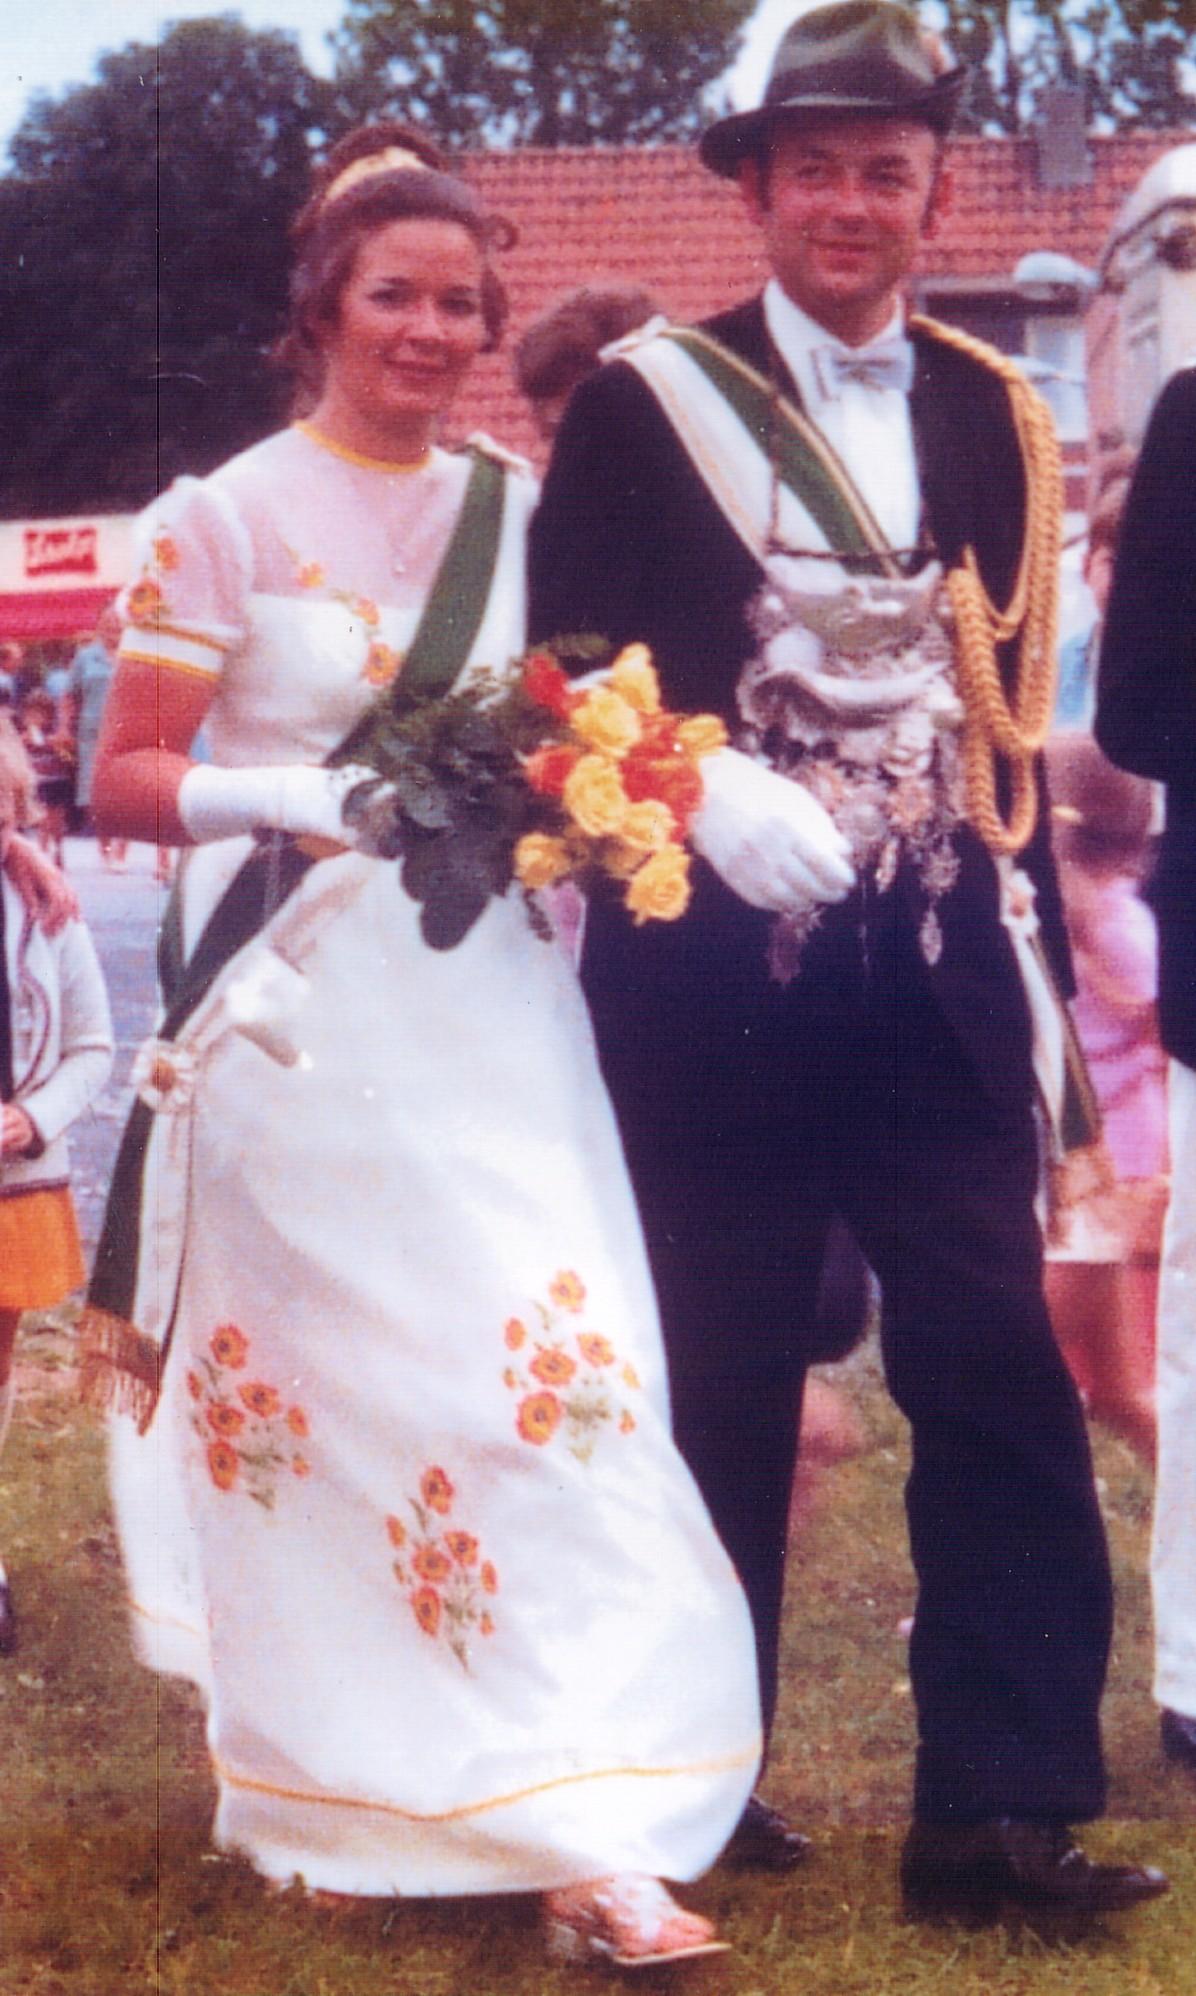 1972 Klemens Hegemann+ & Angelika Lötte